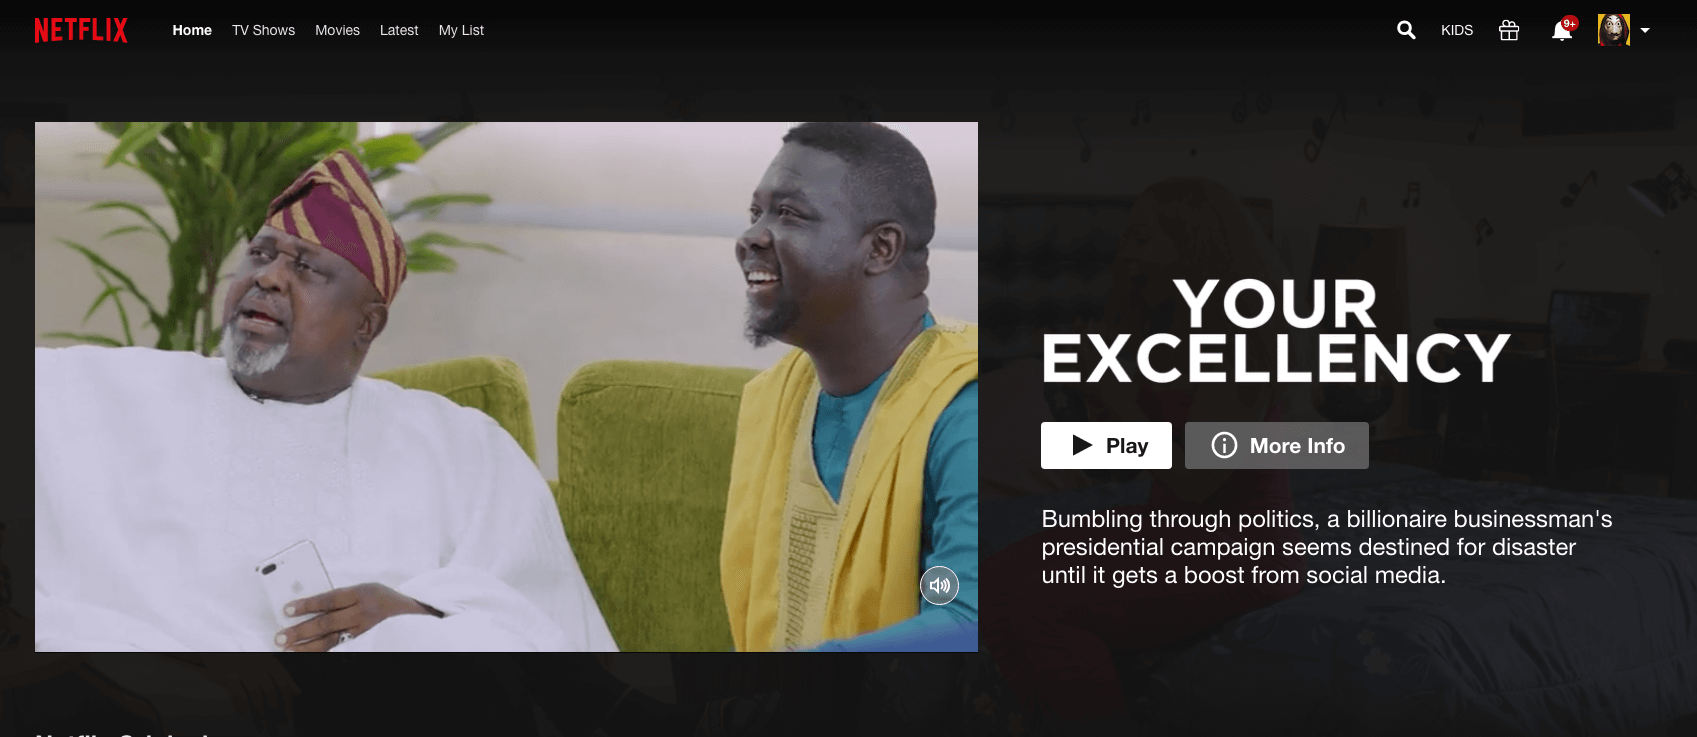 Icymi Ebonylife Films Blockbuster Your Excellency Streaming Now On Netflix Movies Bimbomanuel In 2020 Netflix Film Netflix Streaming